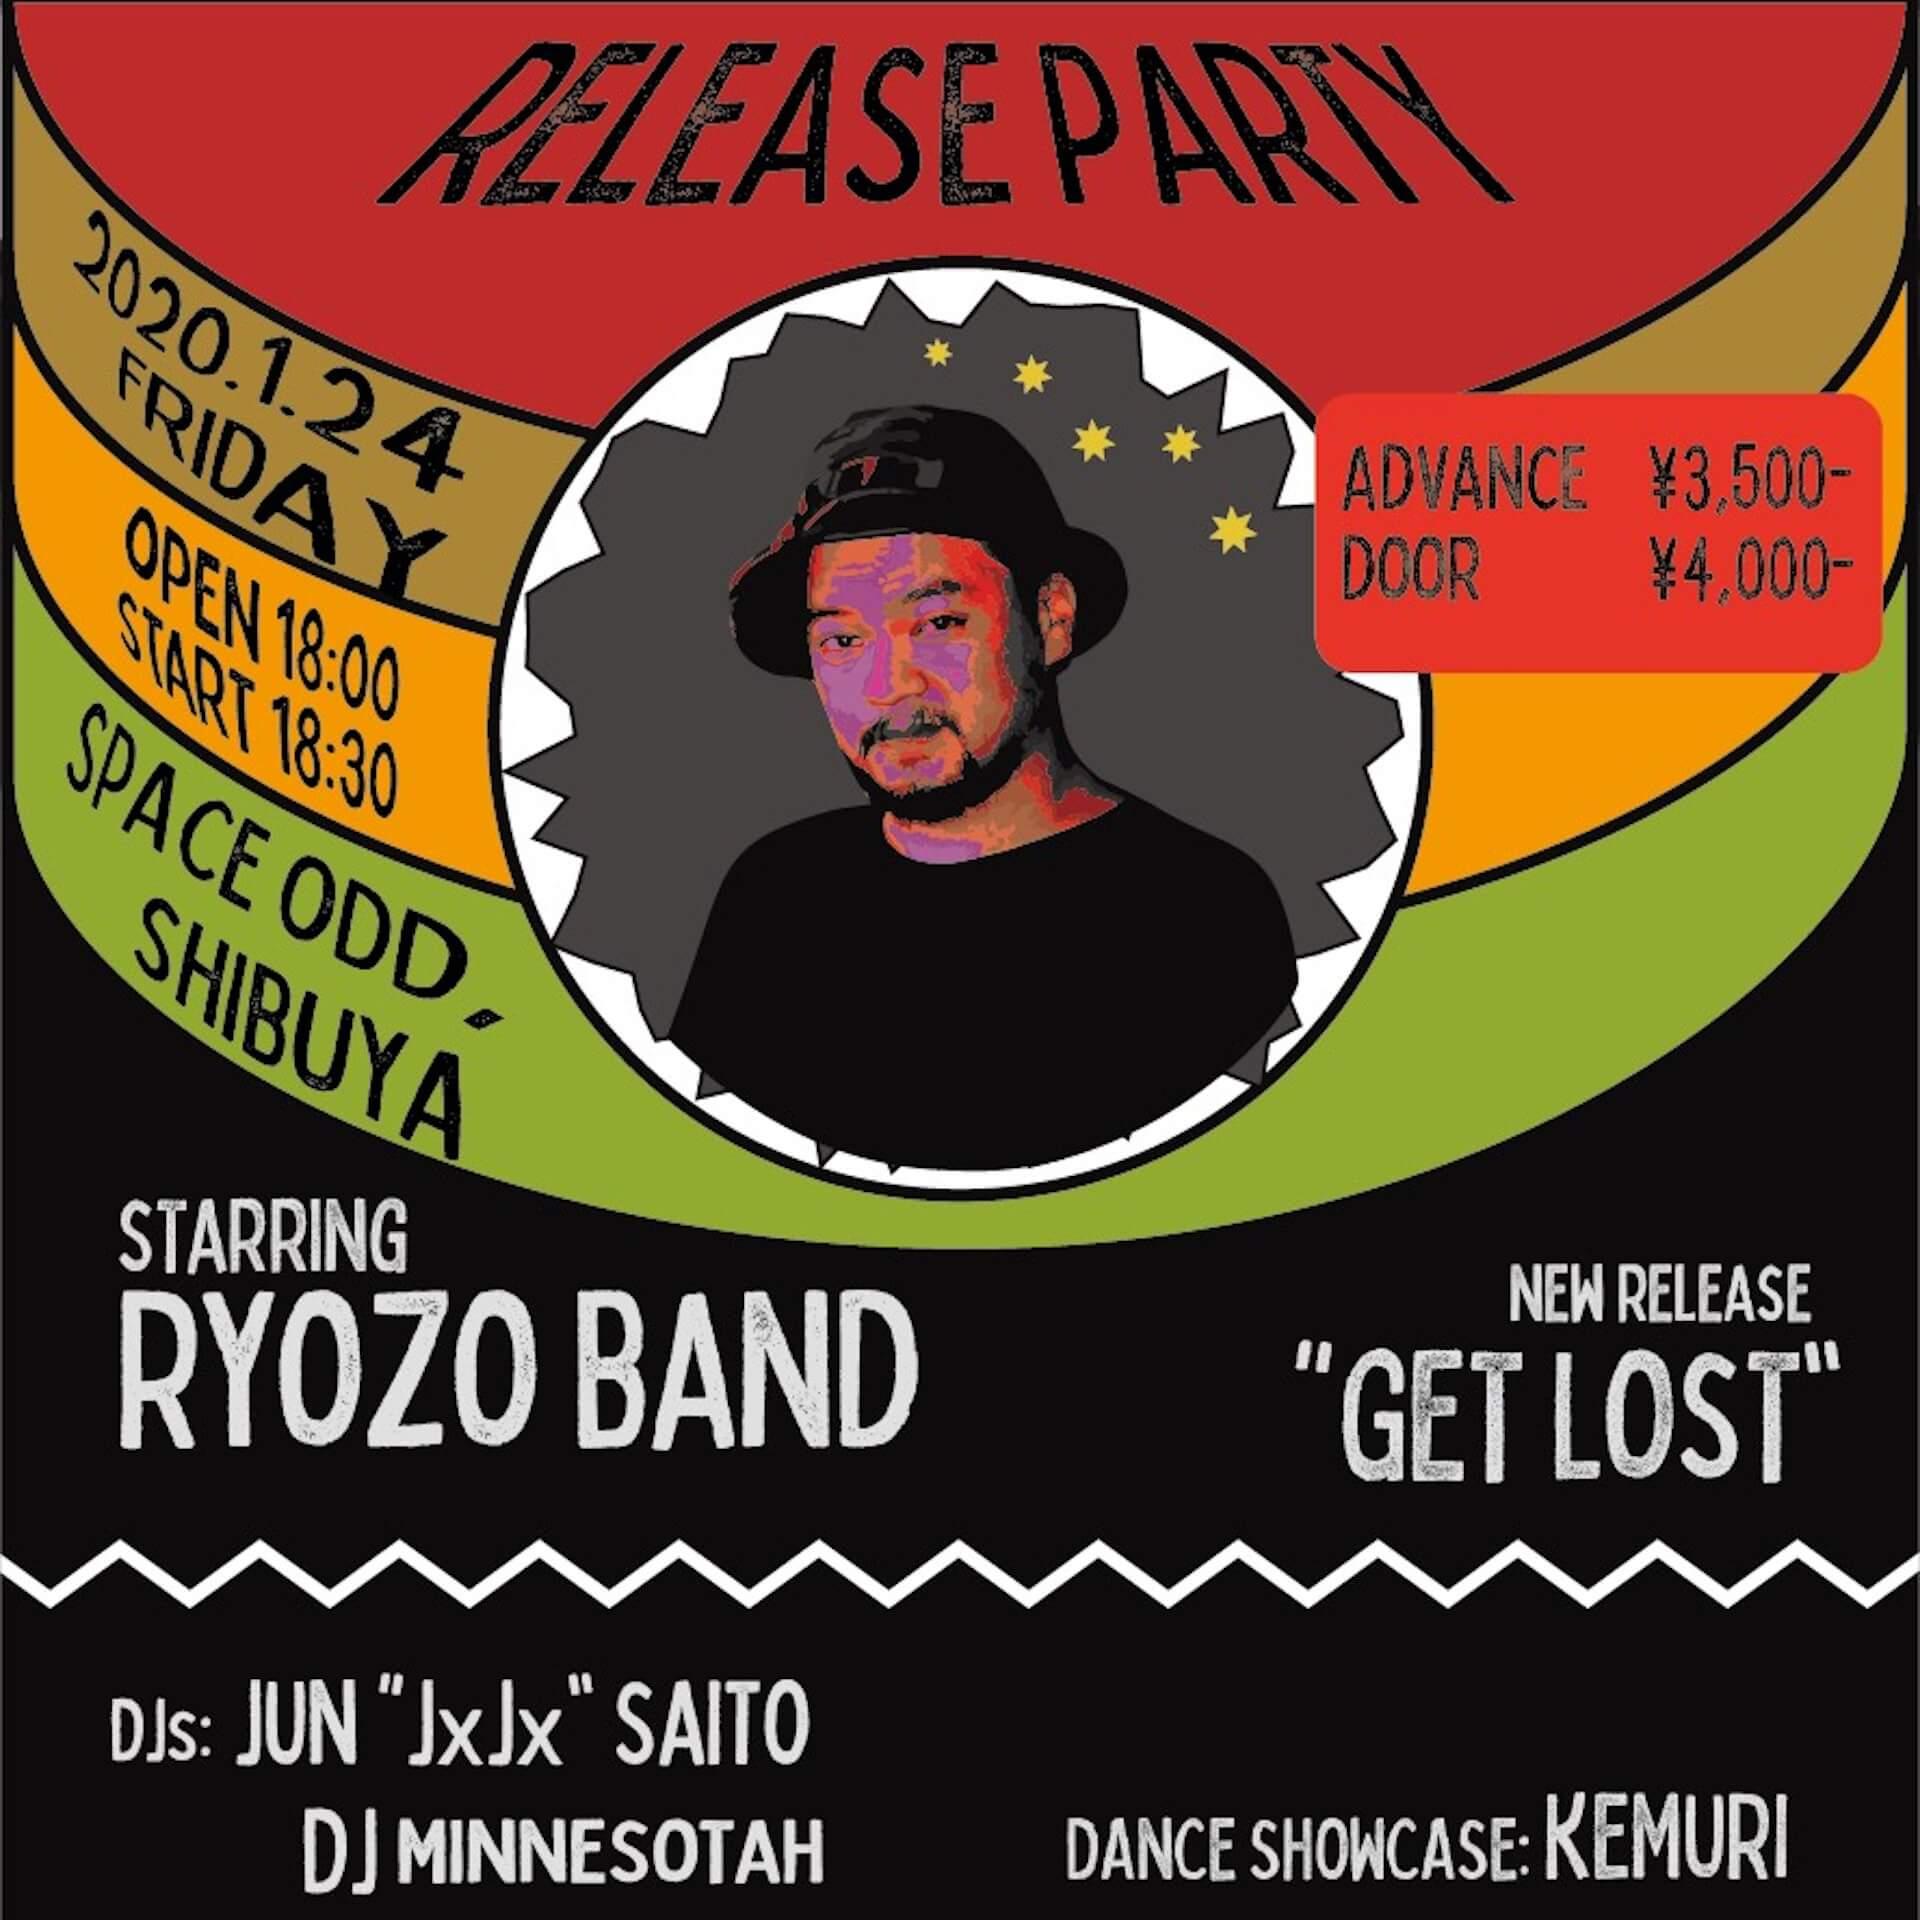 "RYOZO BAND『Get Lost』LP&CDリリースパーティーがSPACE ODDで開催!JUN ""JxJx"" SAITO、DJ Minnesotahら登場 music200114_ryozobandreleaseparty_05"